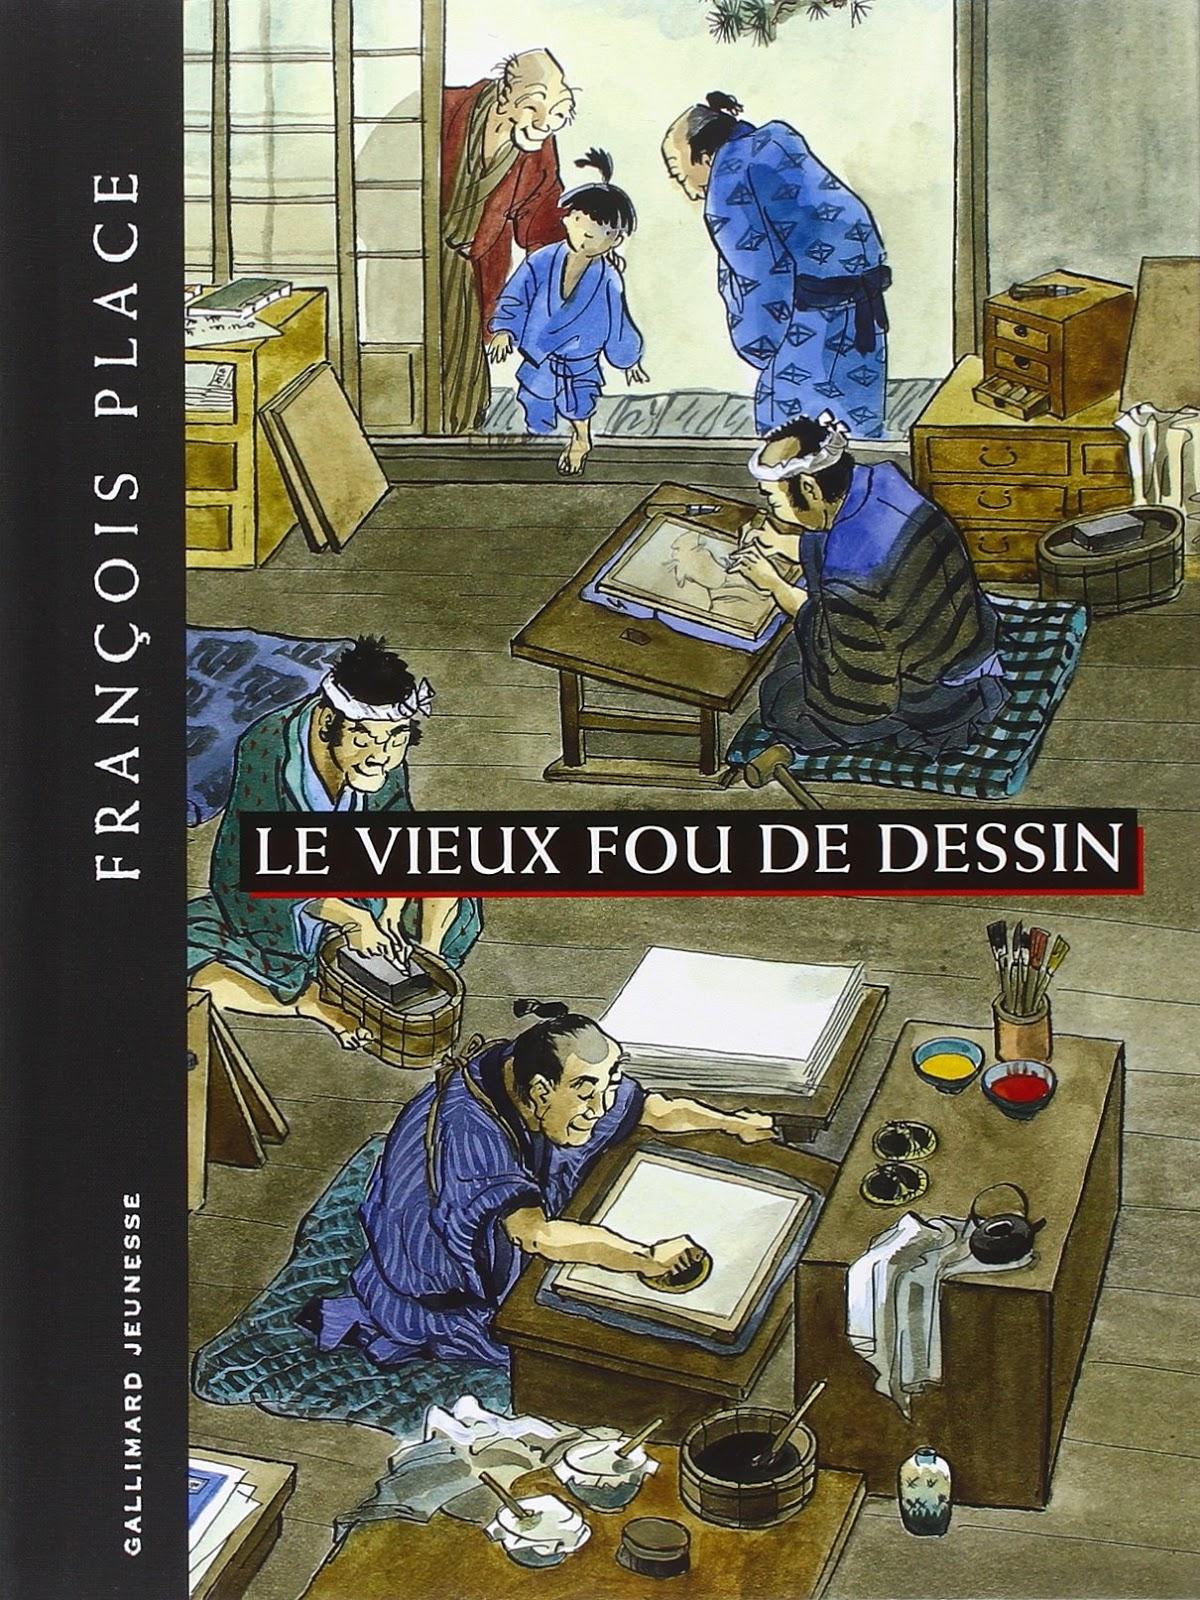 rencontre amoureuse gay poetry a Saint Pierre